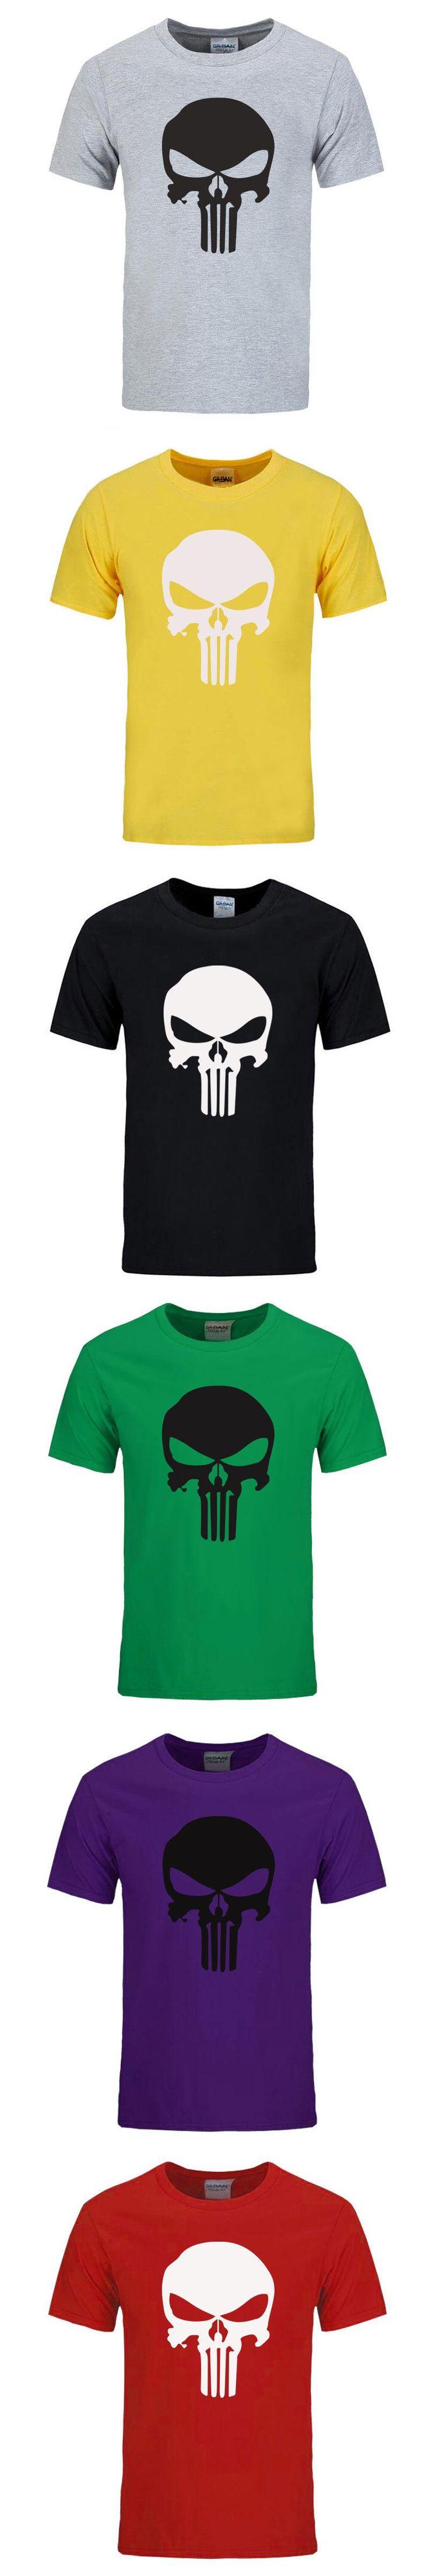 RUMEIAI New Punisher skull Men T shirt Fashion Cotton O neck Hip Hop T shirt Men Casual Short Sleeves T-shirt Men Brand Clothing